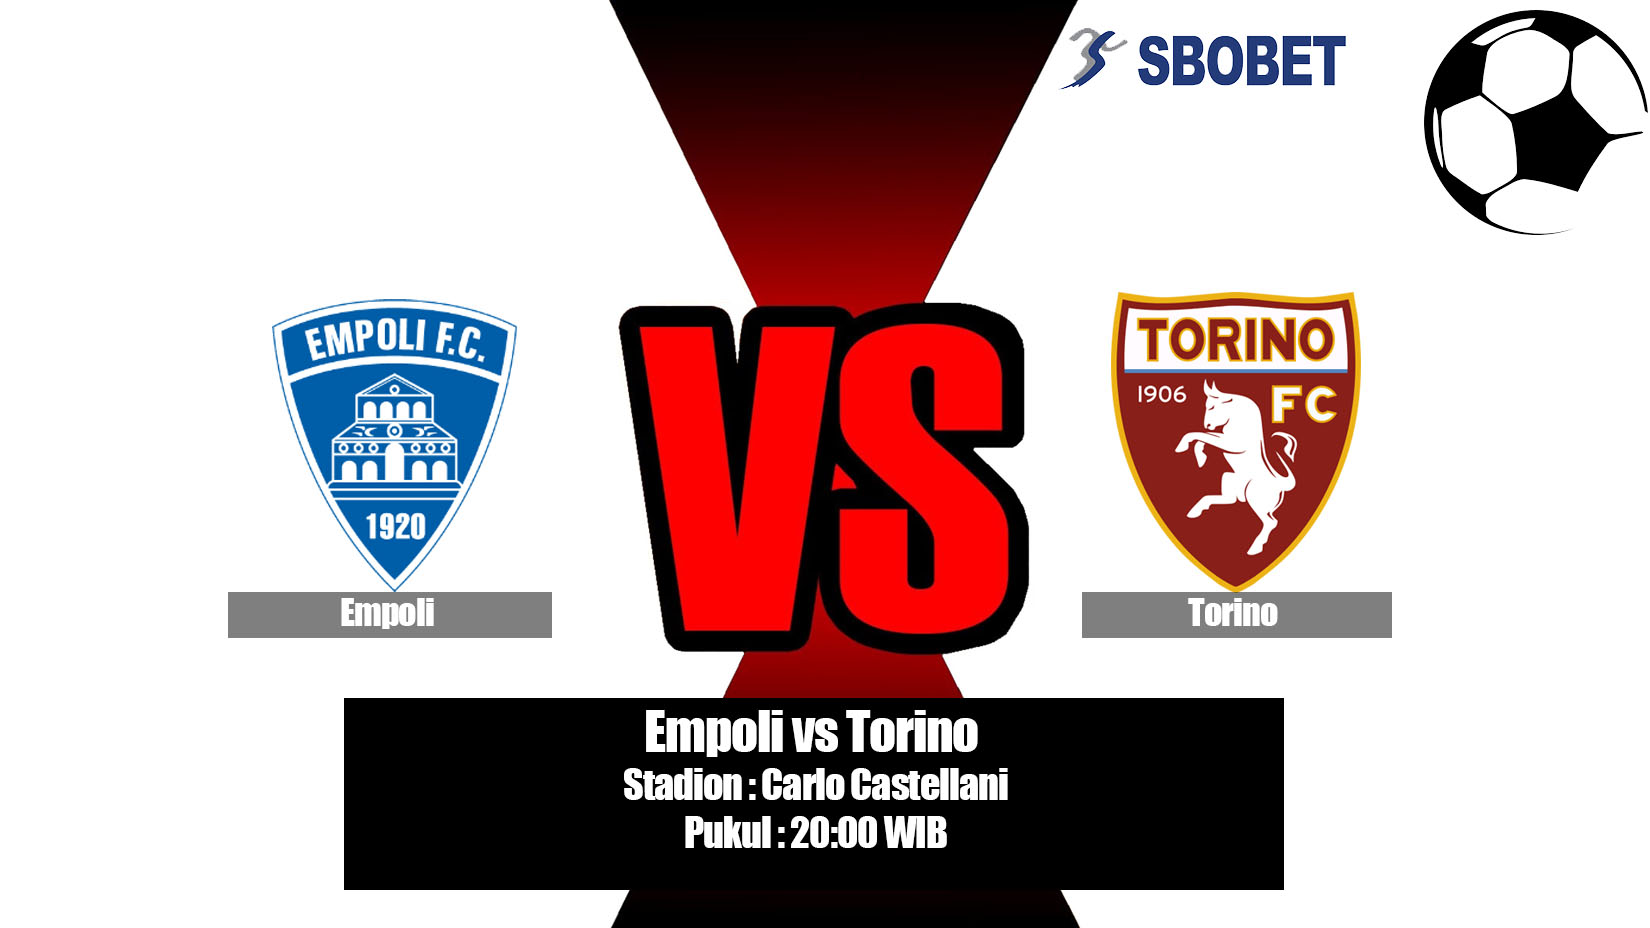 Prediksi Bola Empoli vs Torino 19 Mei 2019